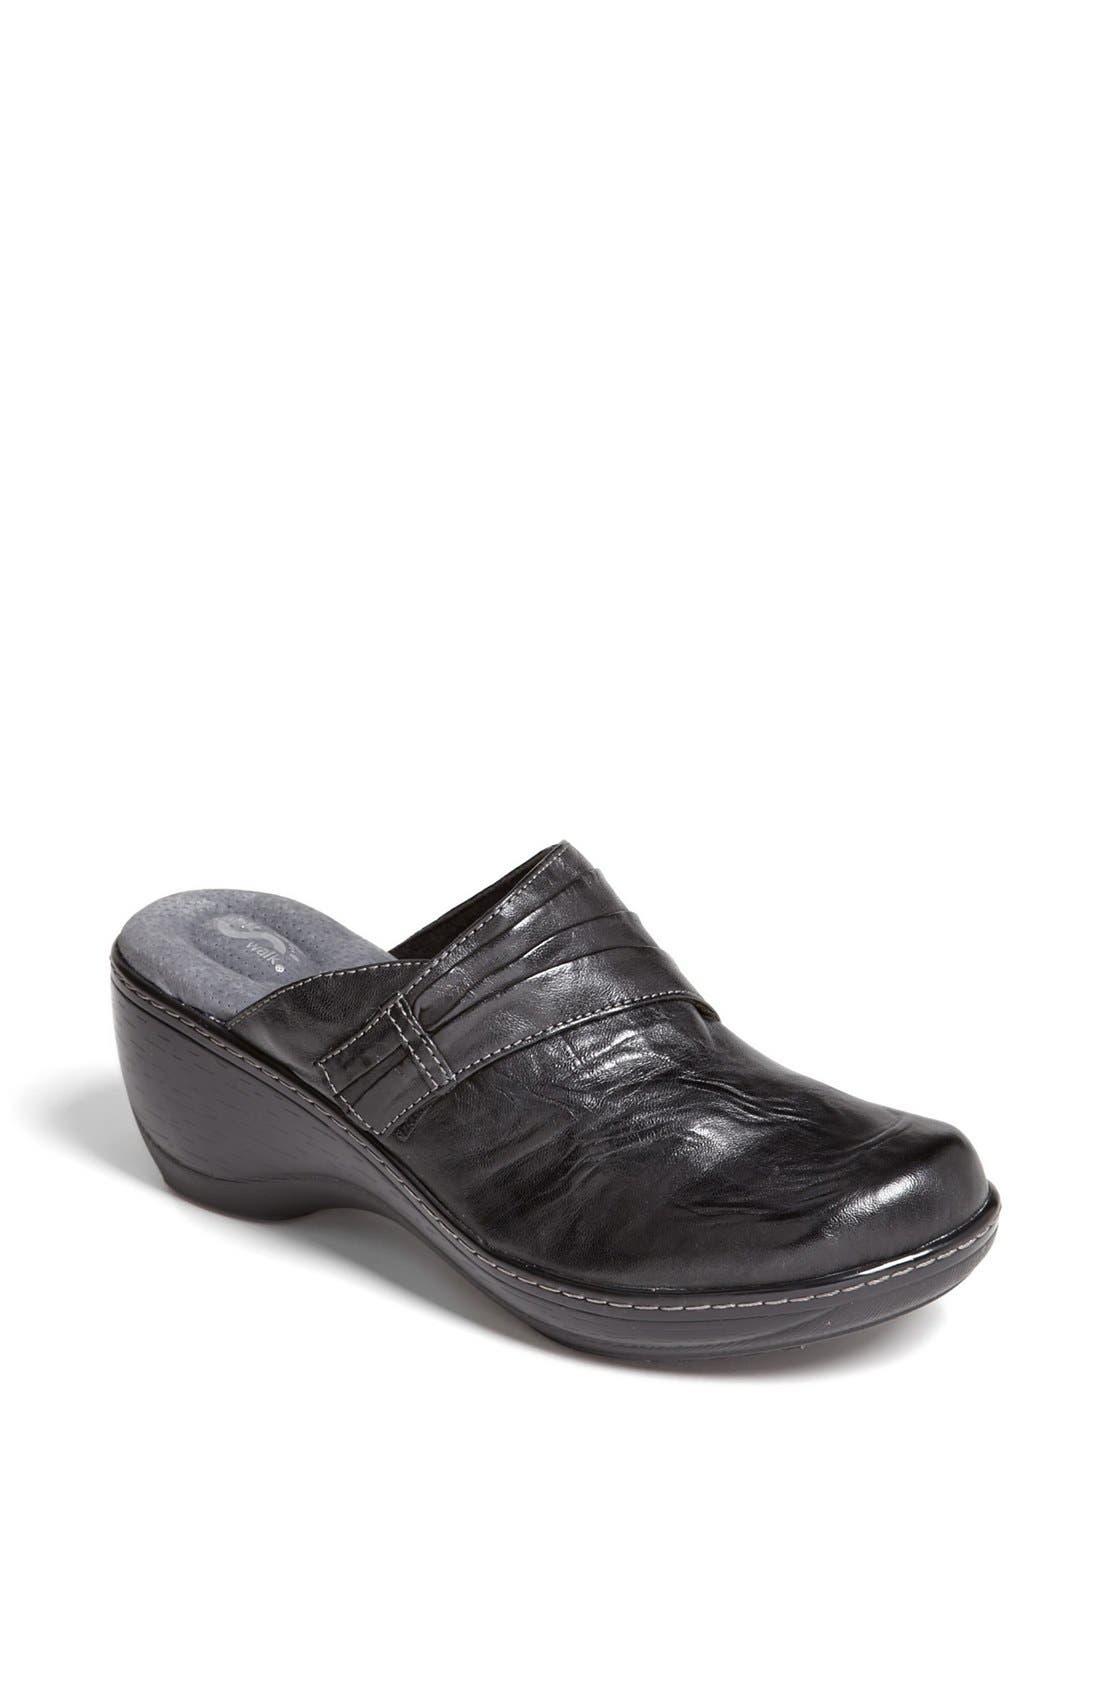 SOFTWALK<SUP>®</SUP> 'Mason' Clog, Main, color, BLACK LEATHER